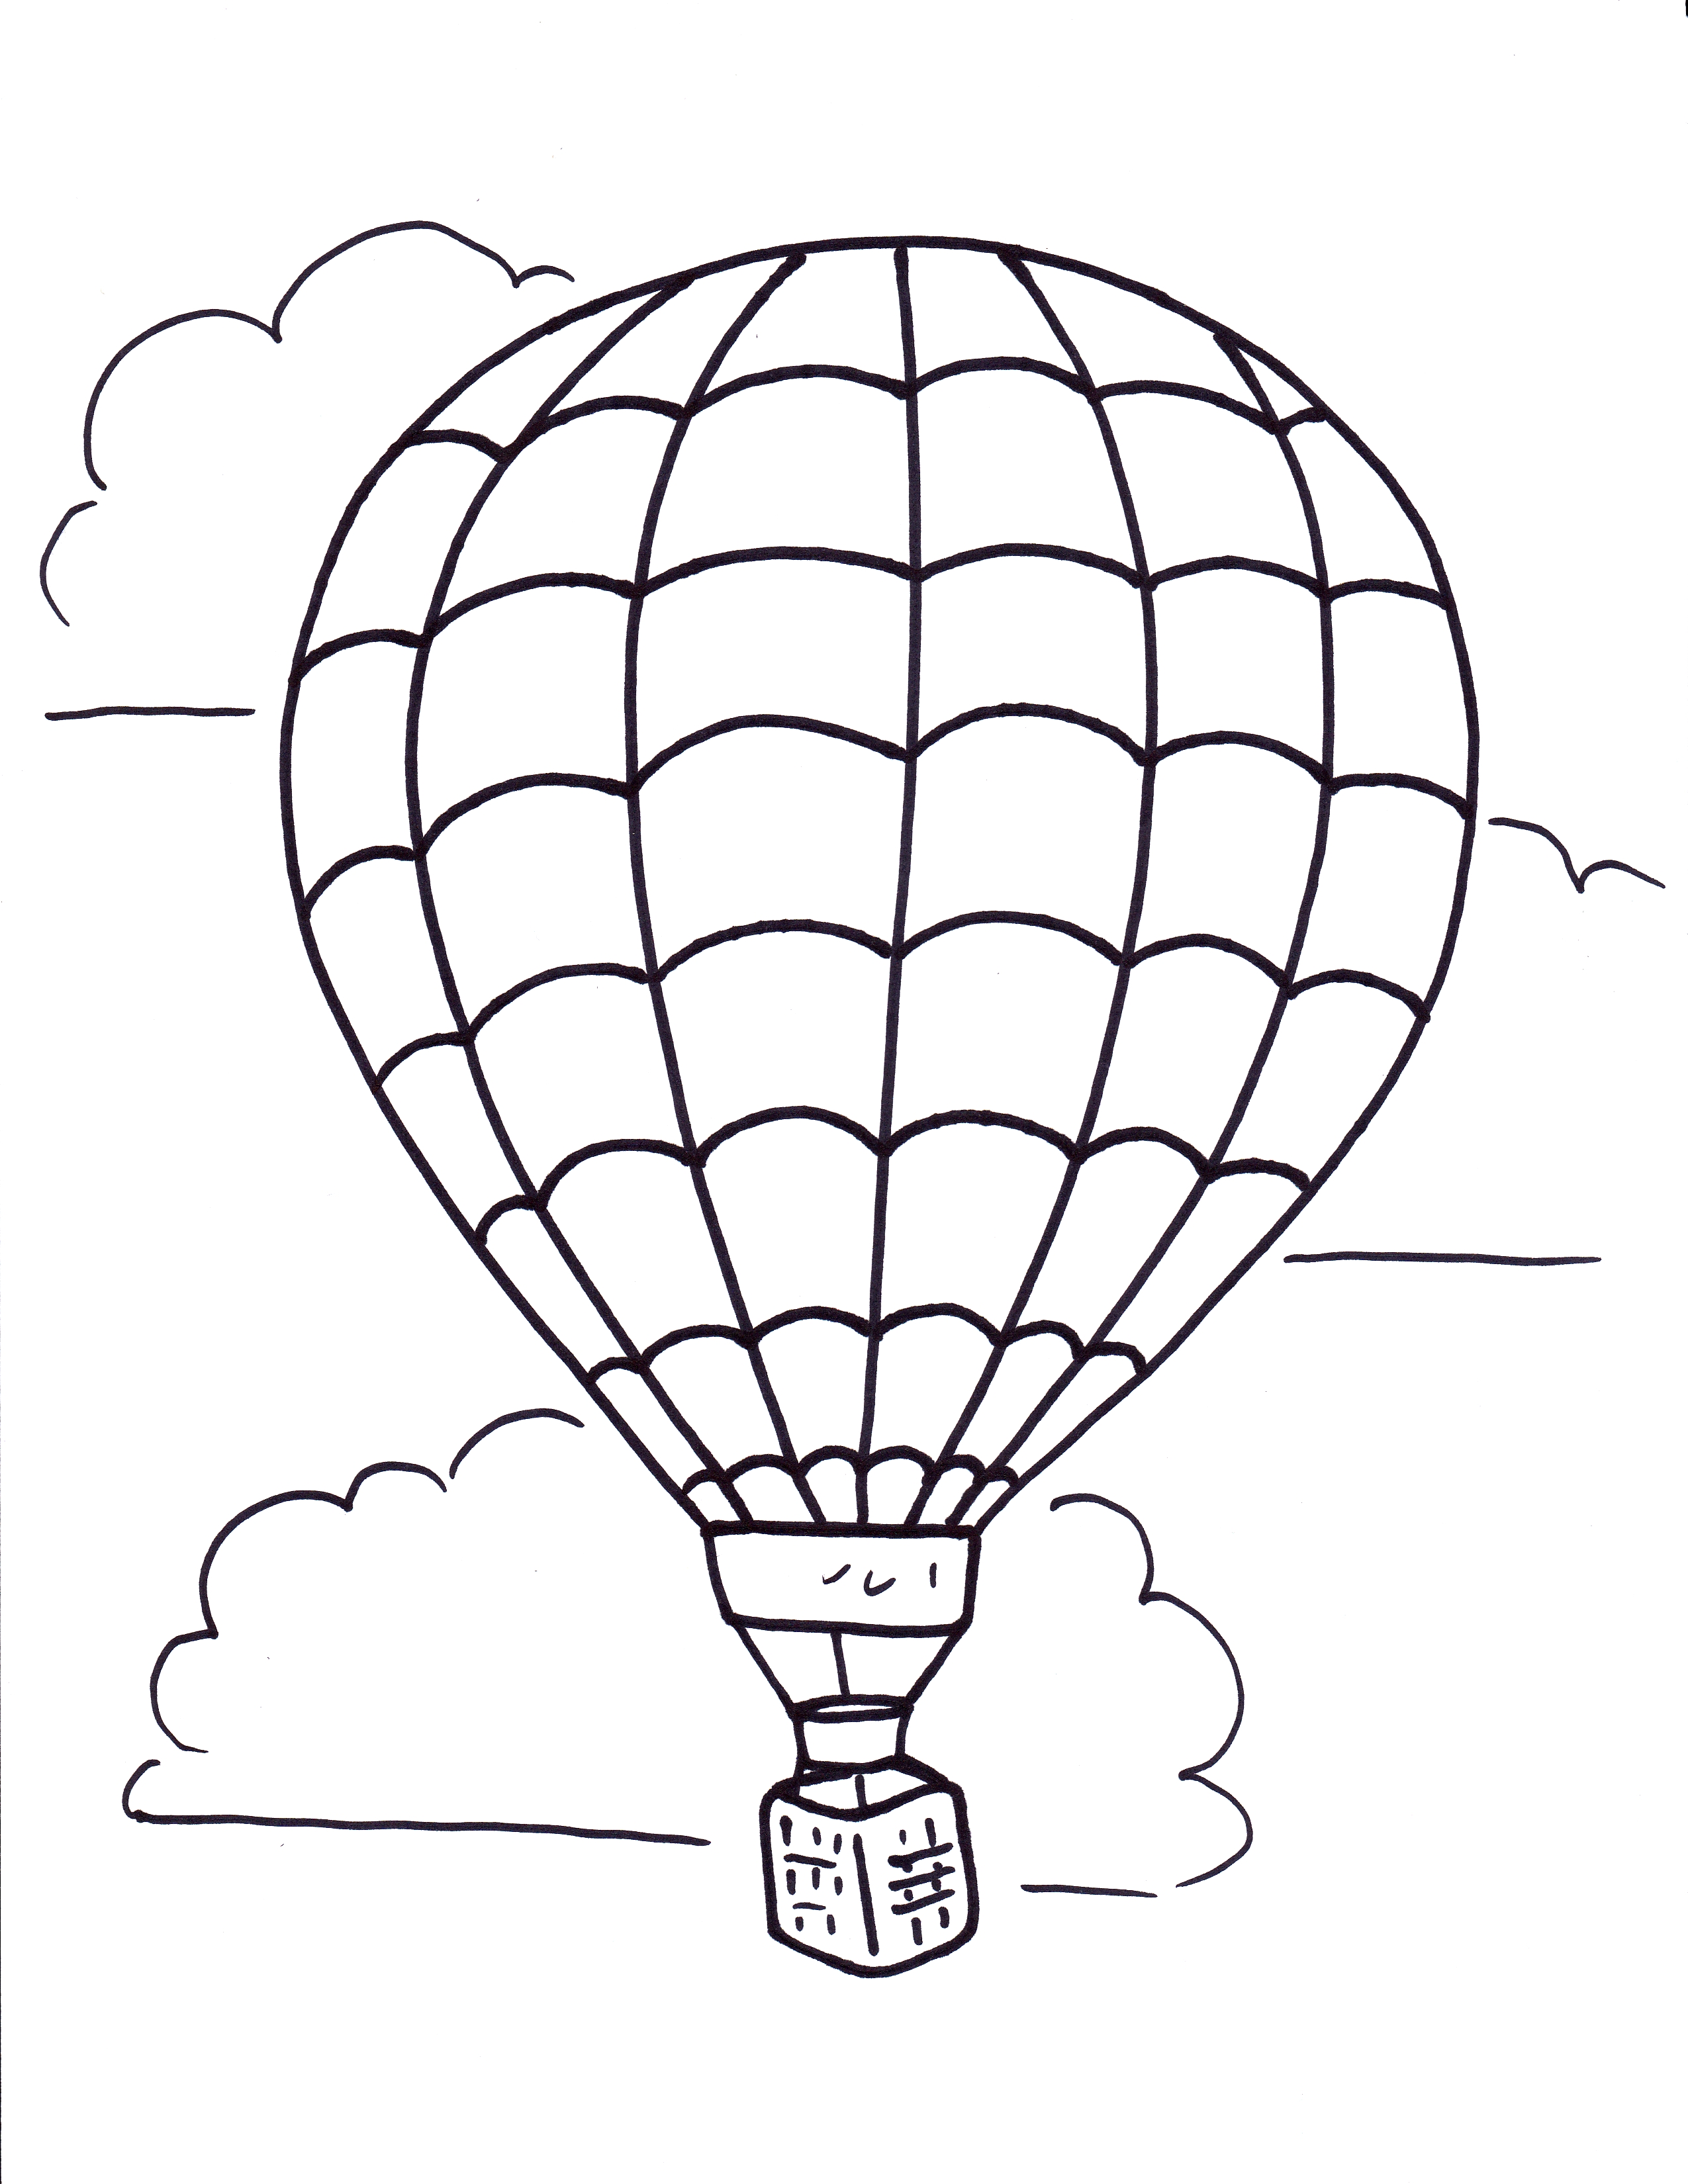 Free hot air balloon clipart black and white clip art library Hot air balloon black and white related hot air balloon coloring ... clip art library